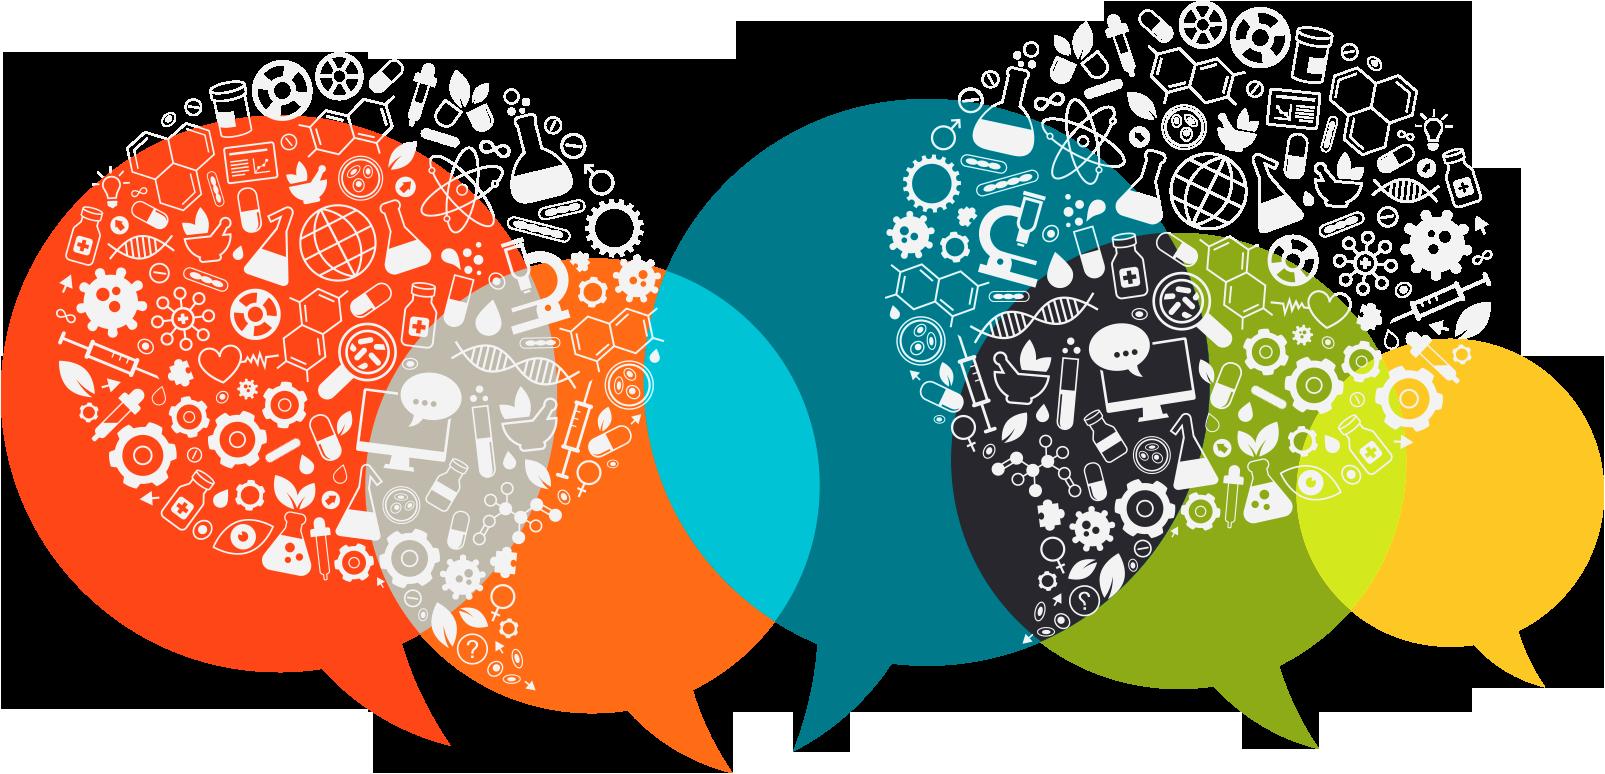 Digital first blog book. Community clipart social need